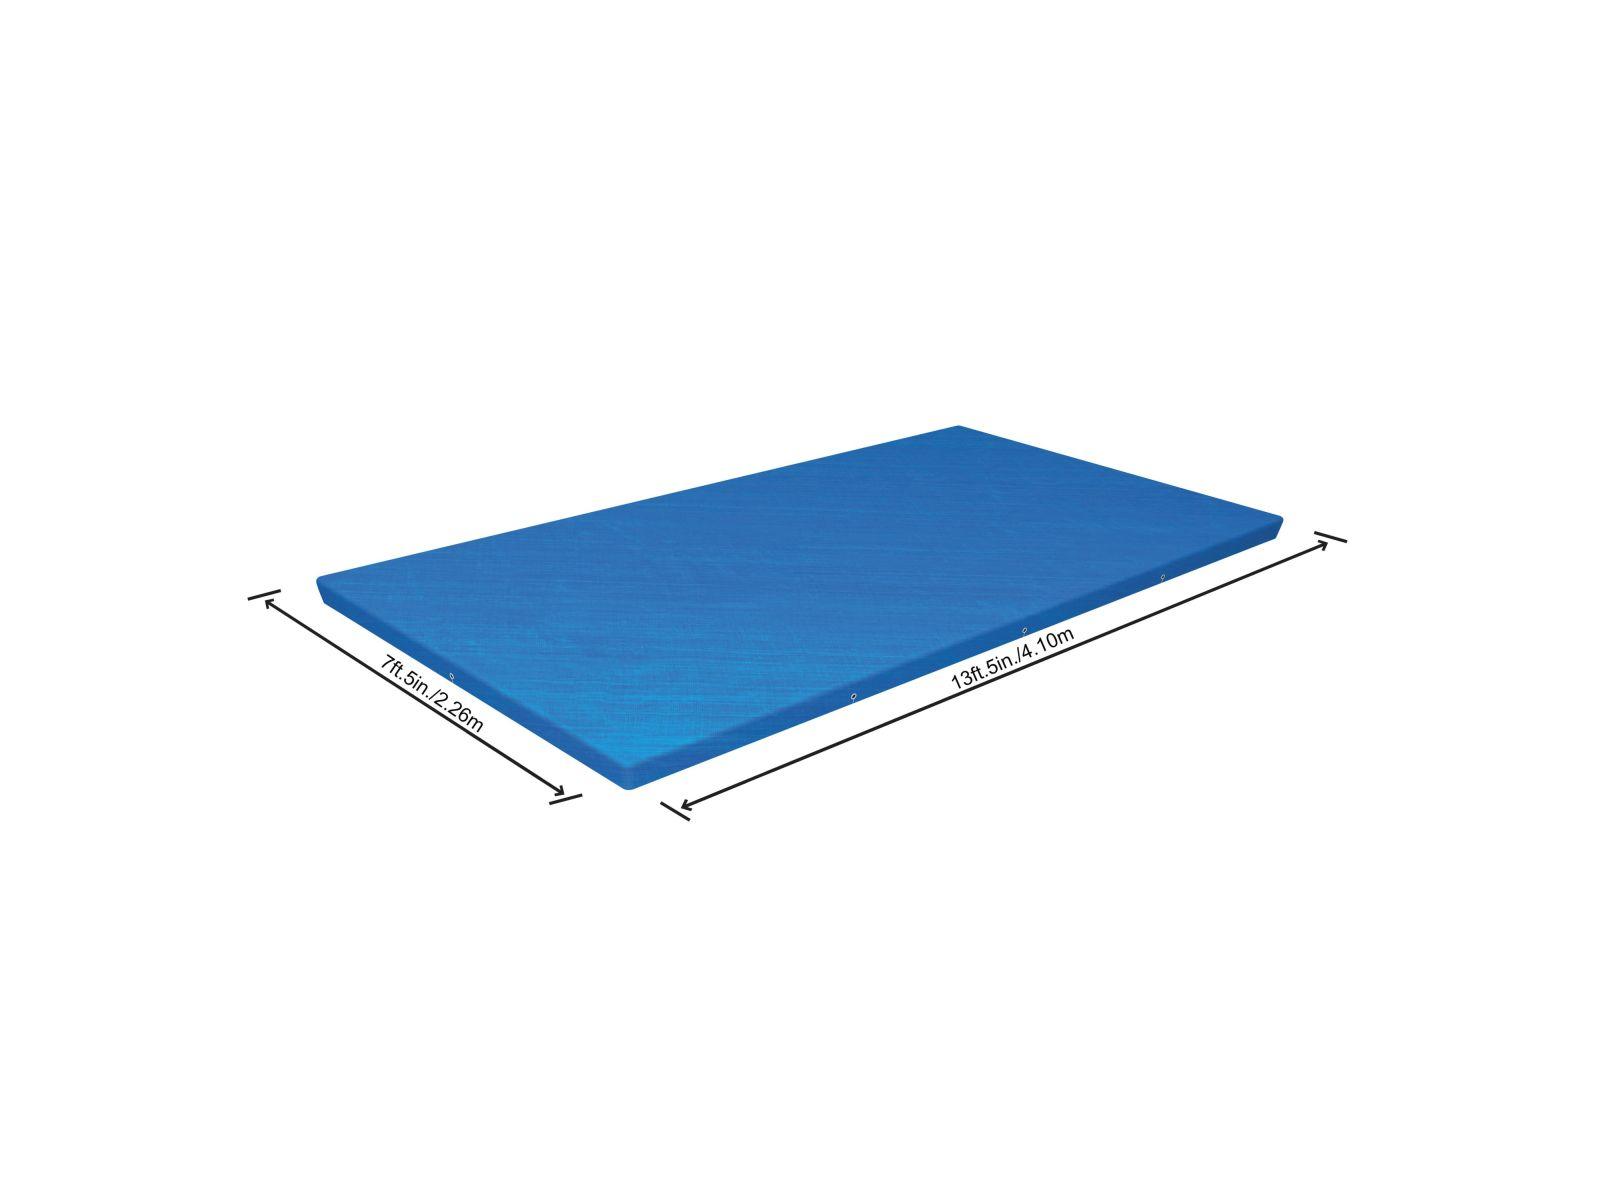 Bestway copripiscina steel pro frame rettangolare 400x211x81 cm -